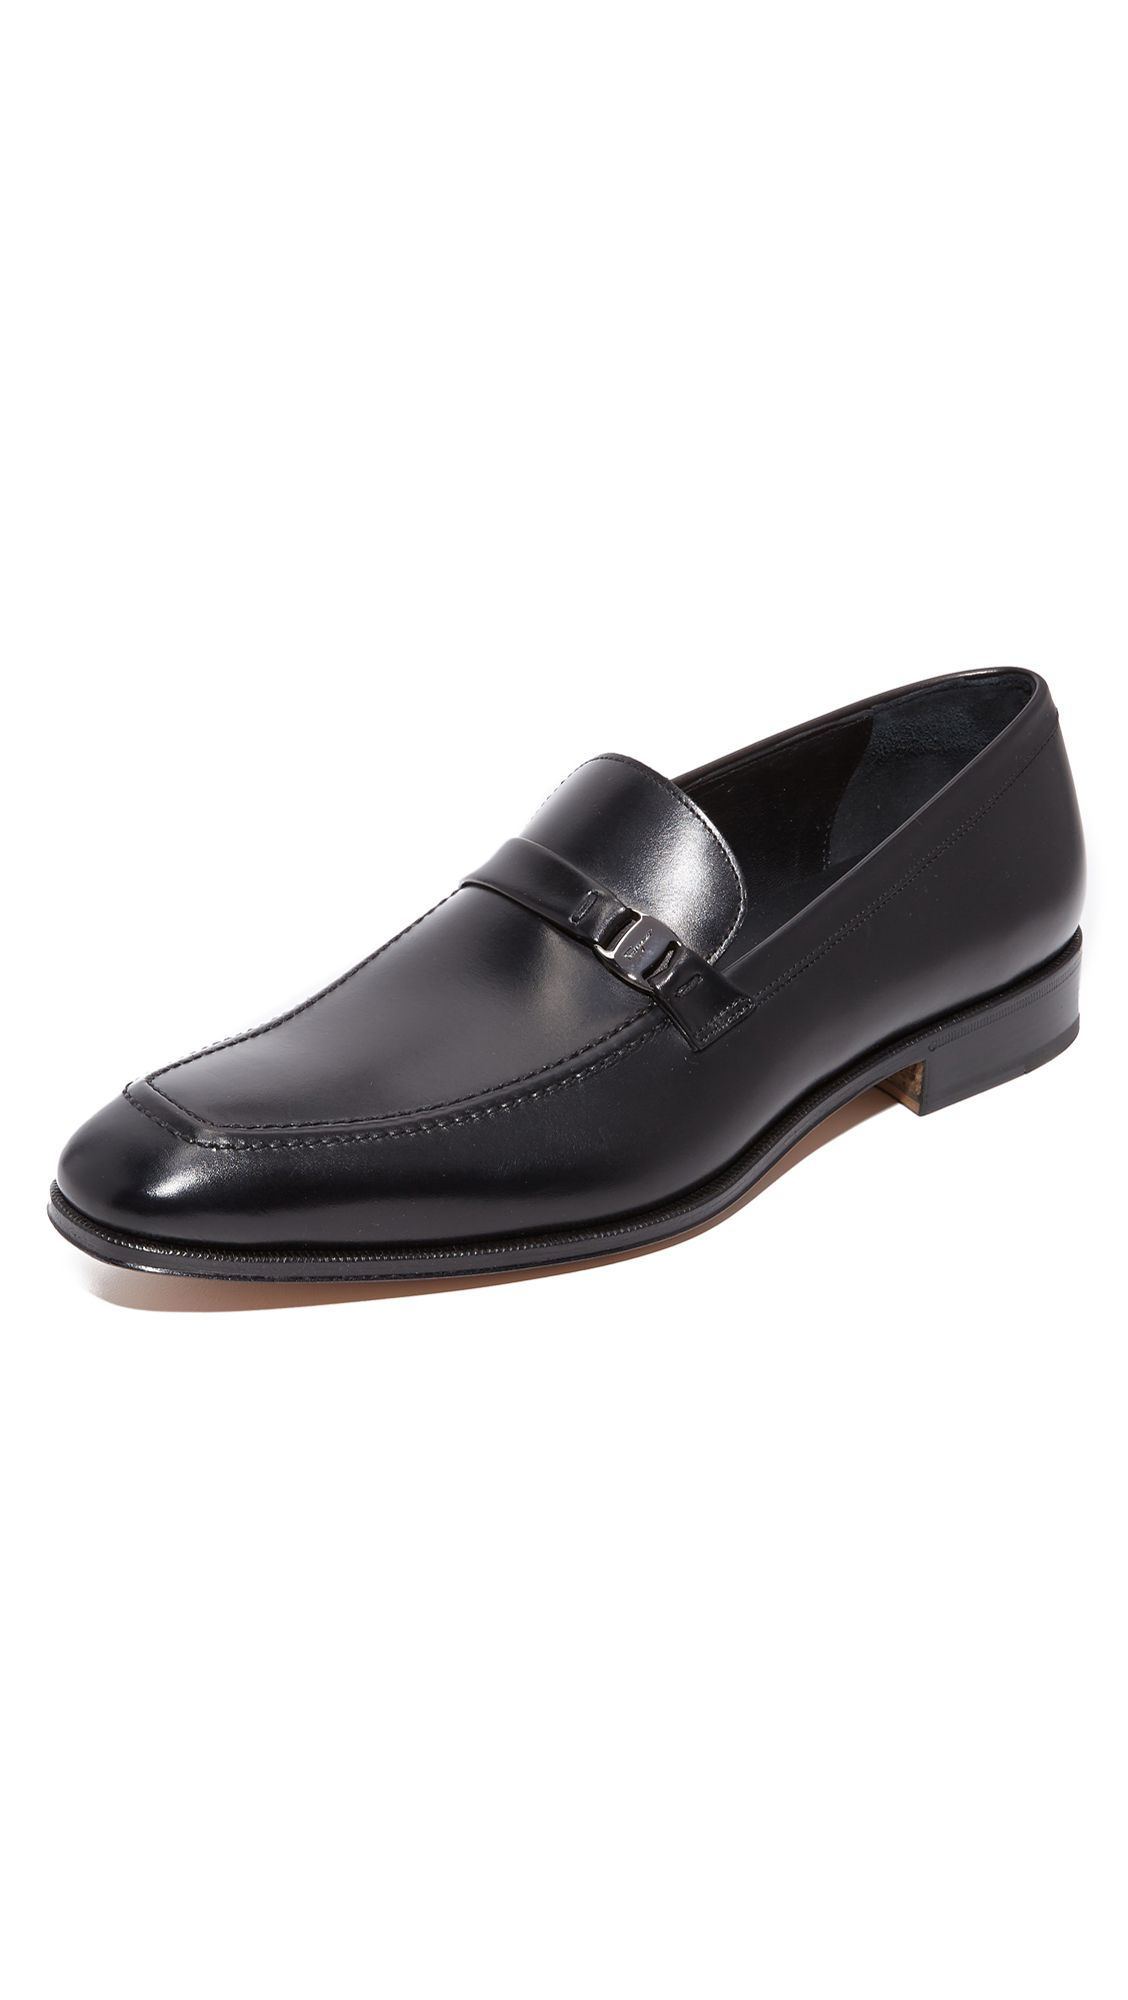 Salvatore Ferragamo Men's Suede Apron Toe Loafers Y906gD1